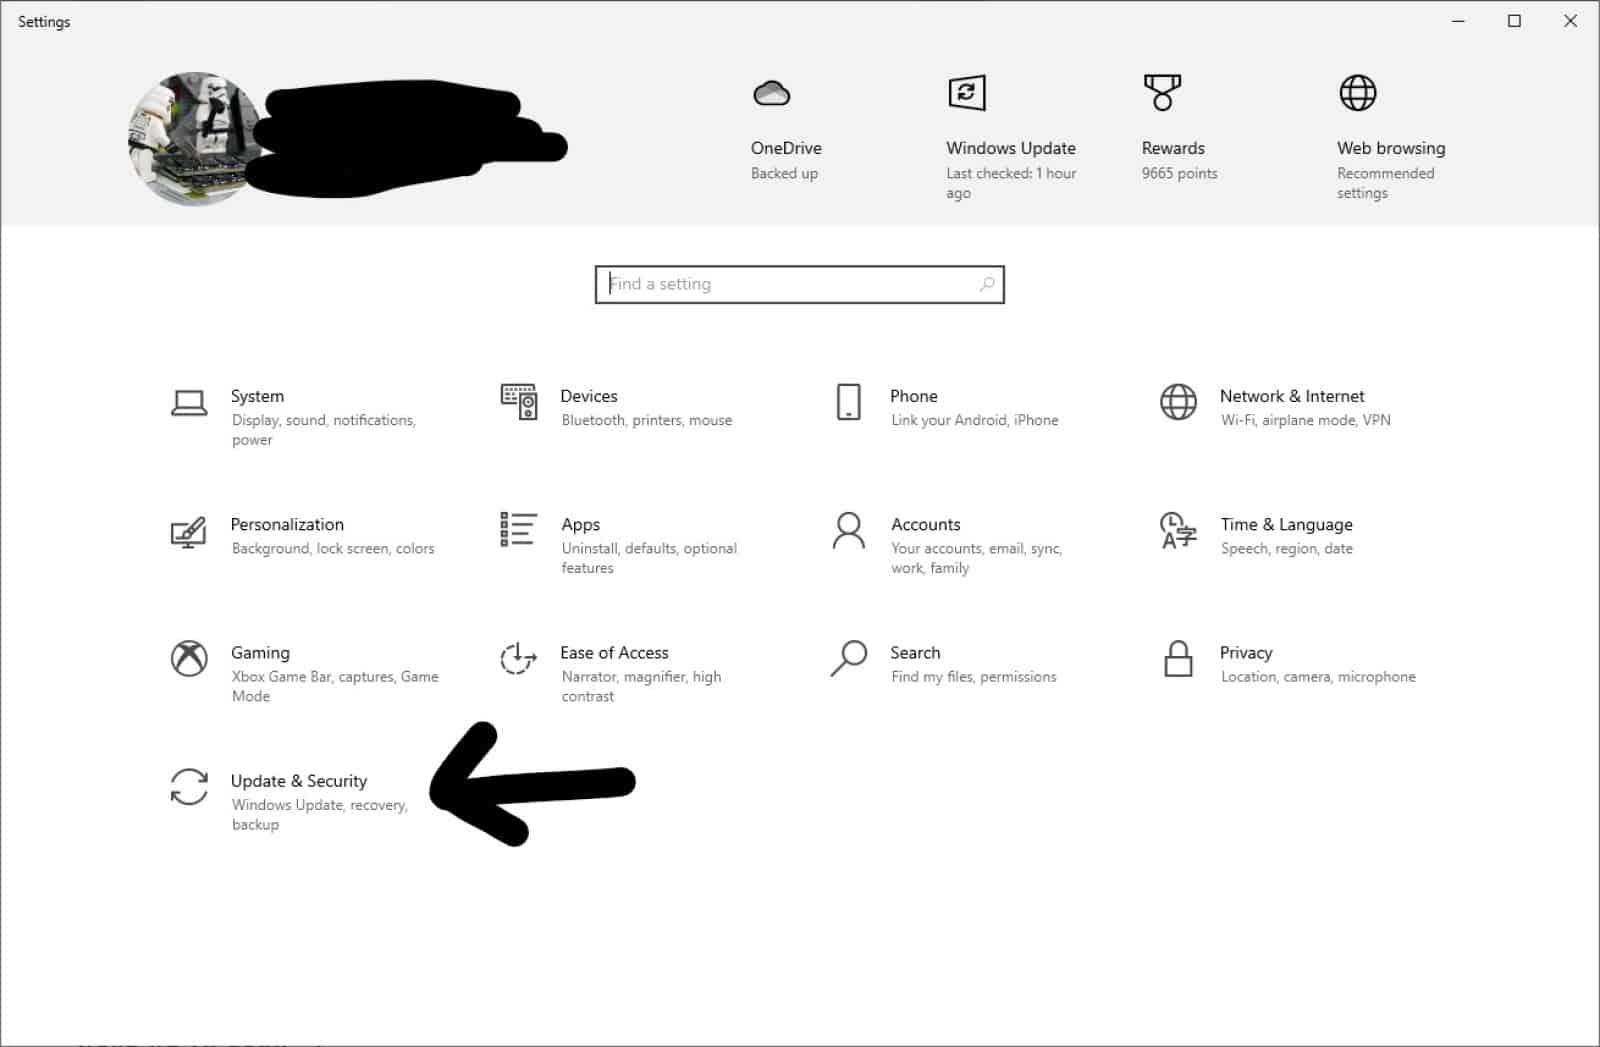 windows 10 settings main page